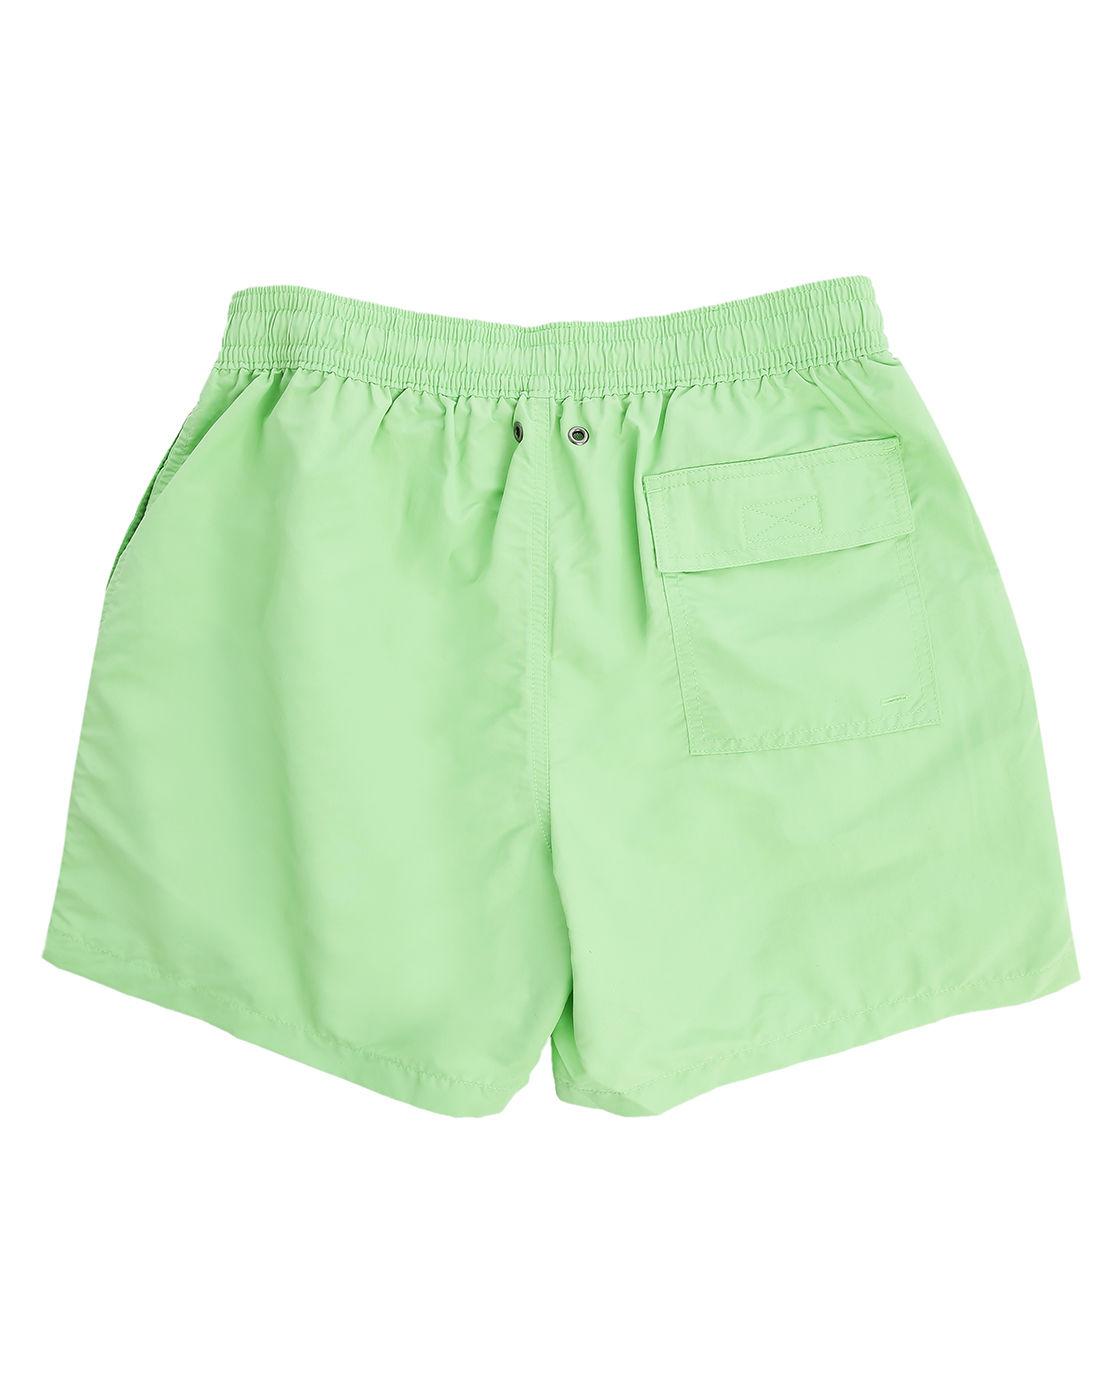 ralph lauren hampton swim shorts - WörterSee Public Relations d4c2ad014